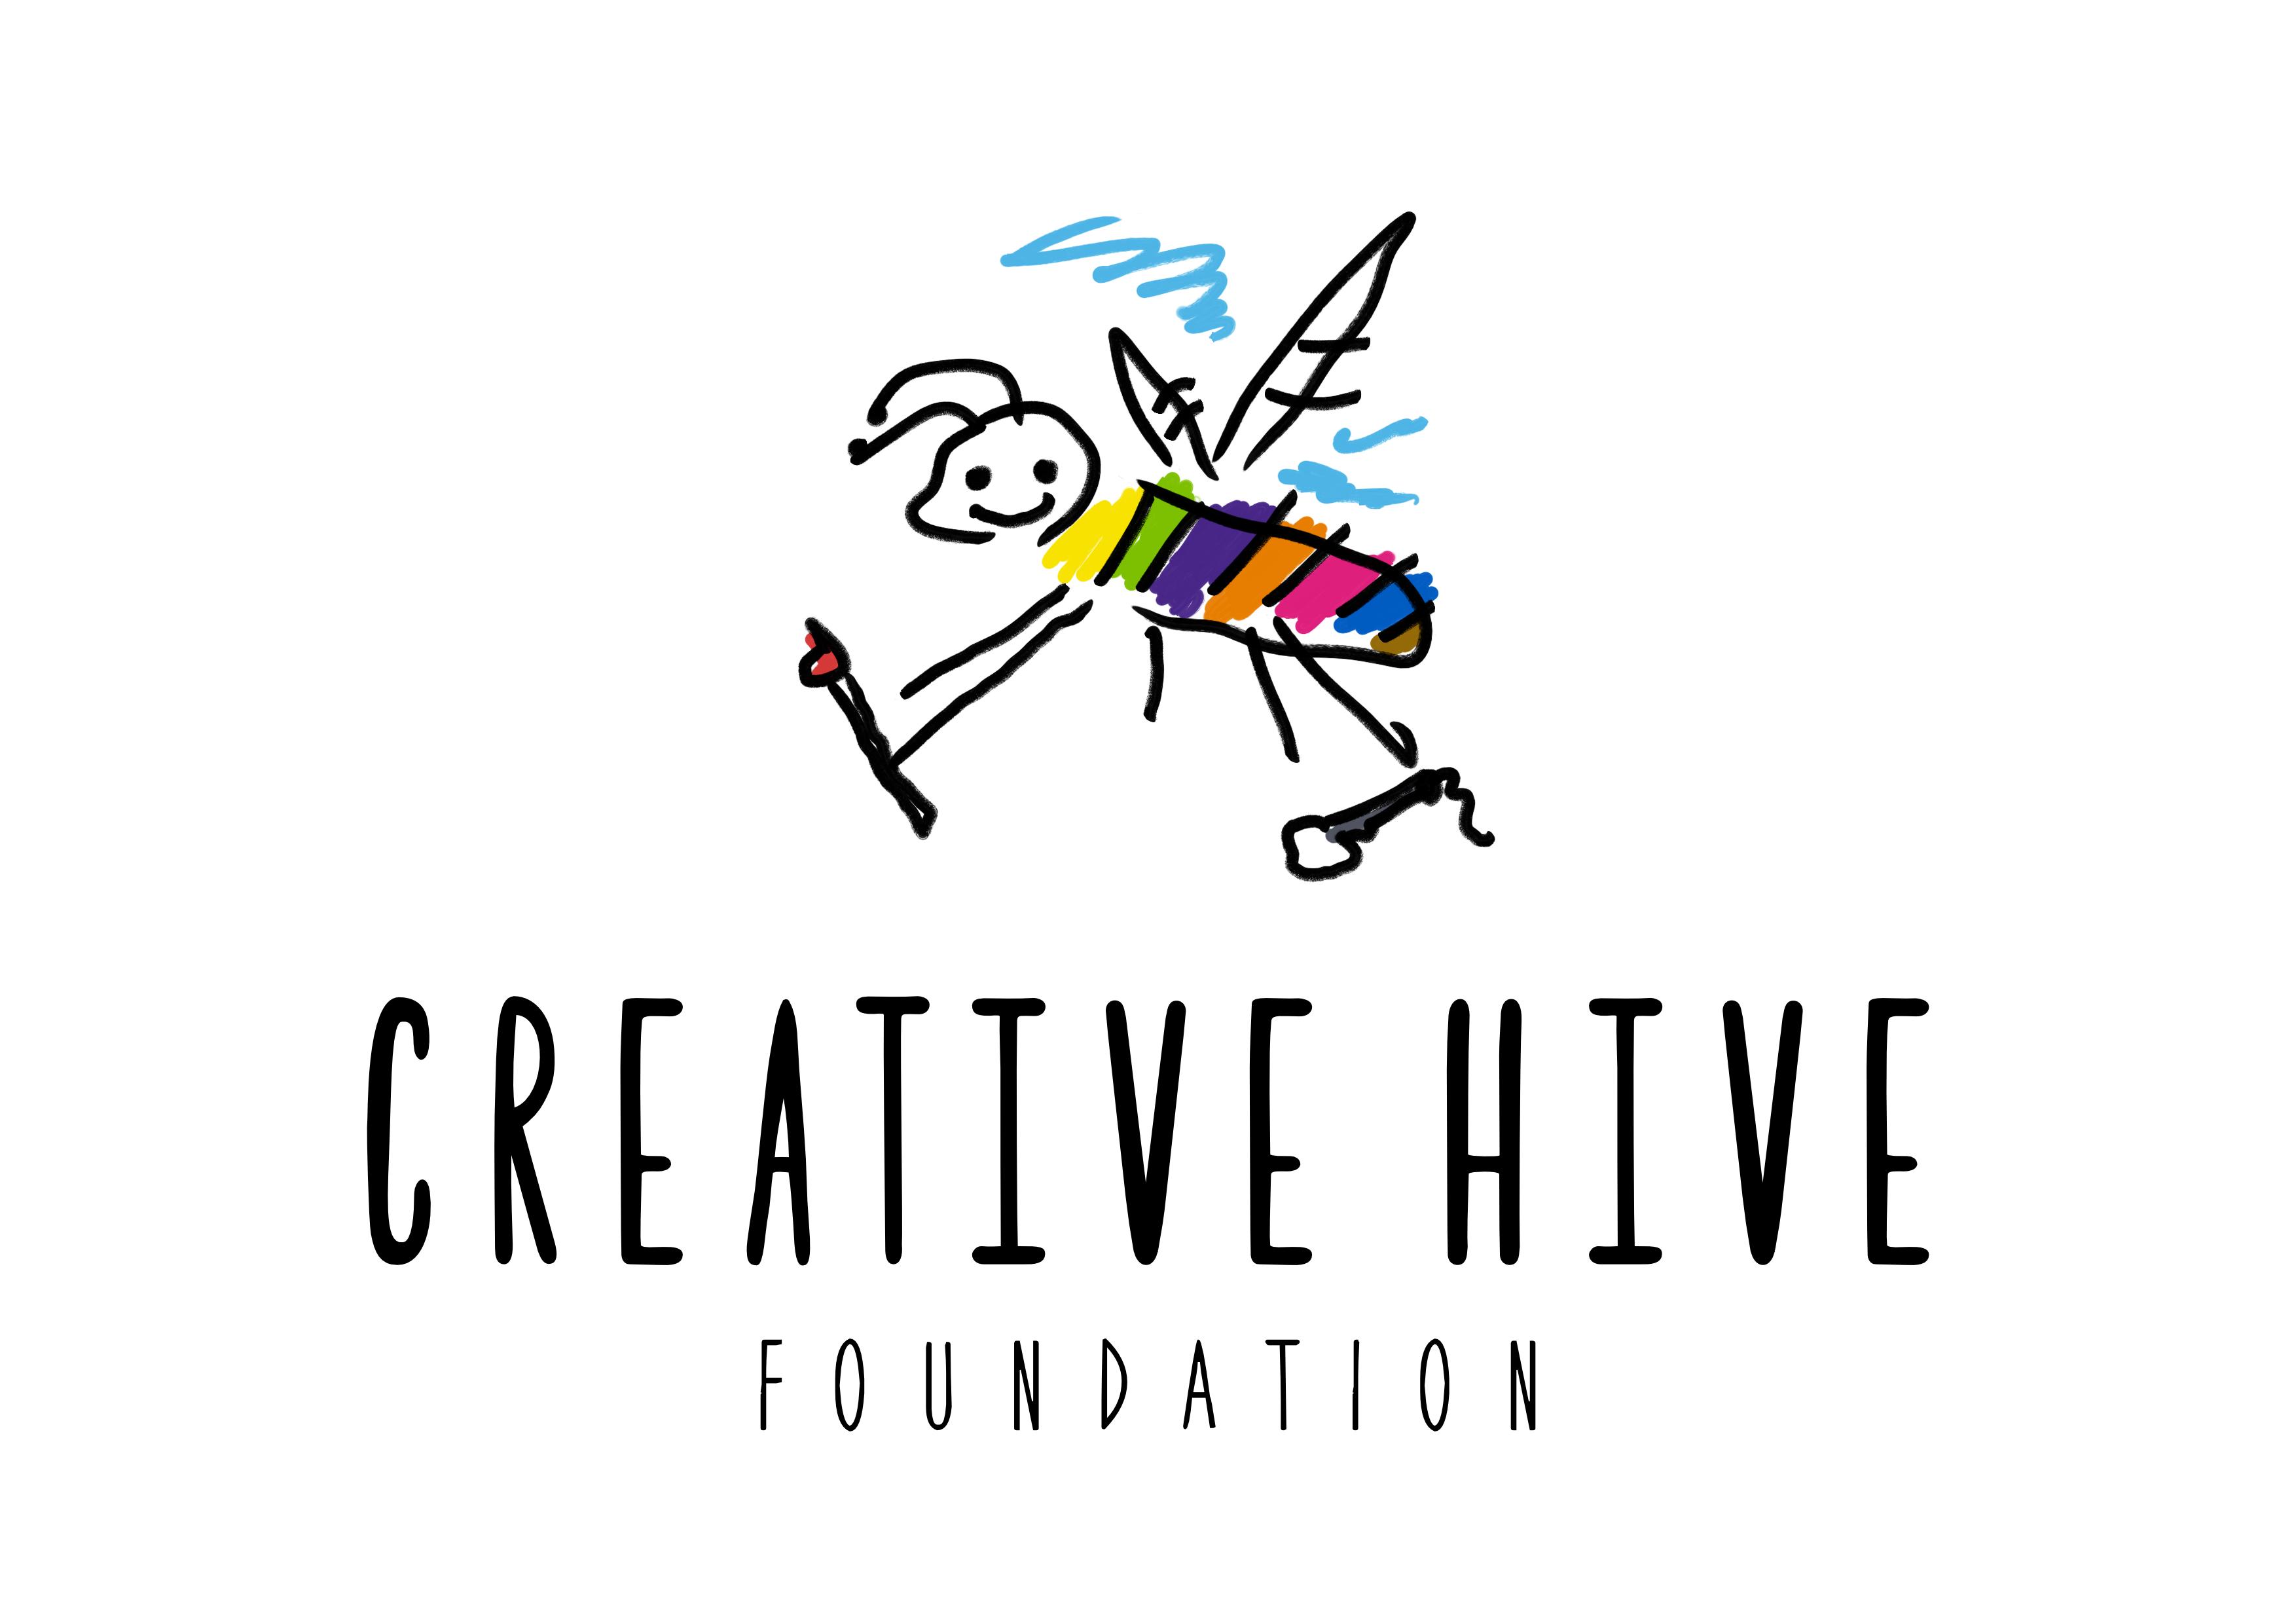 _creative_hive_logo_OP2_1_1